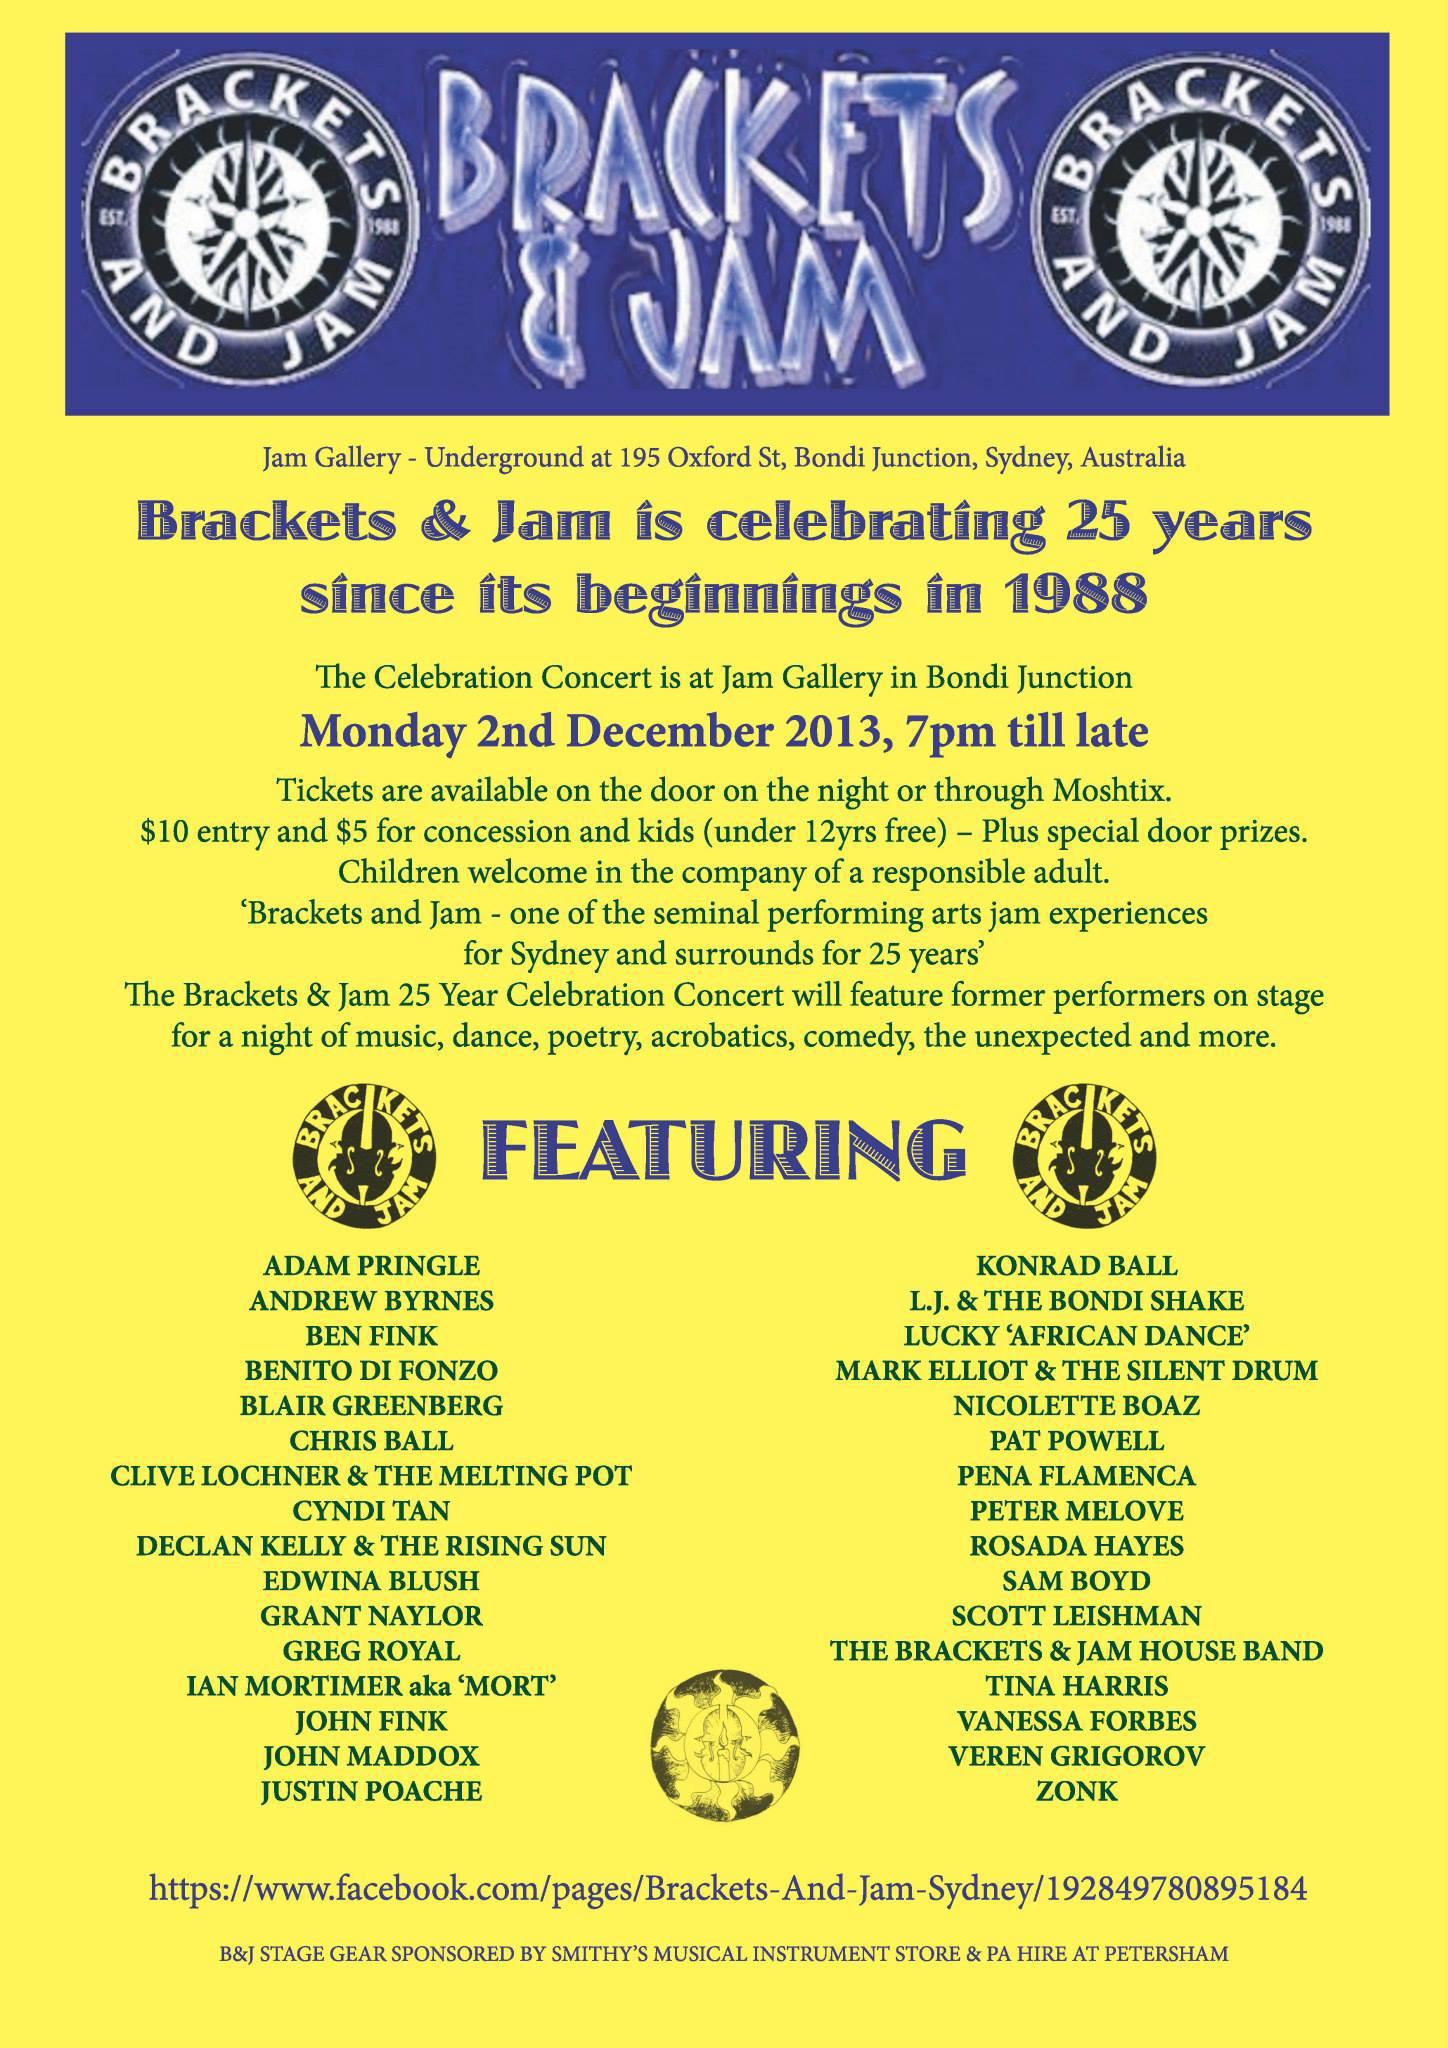 Brackets & Jam 25th Anniversary.jpg